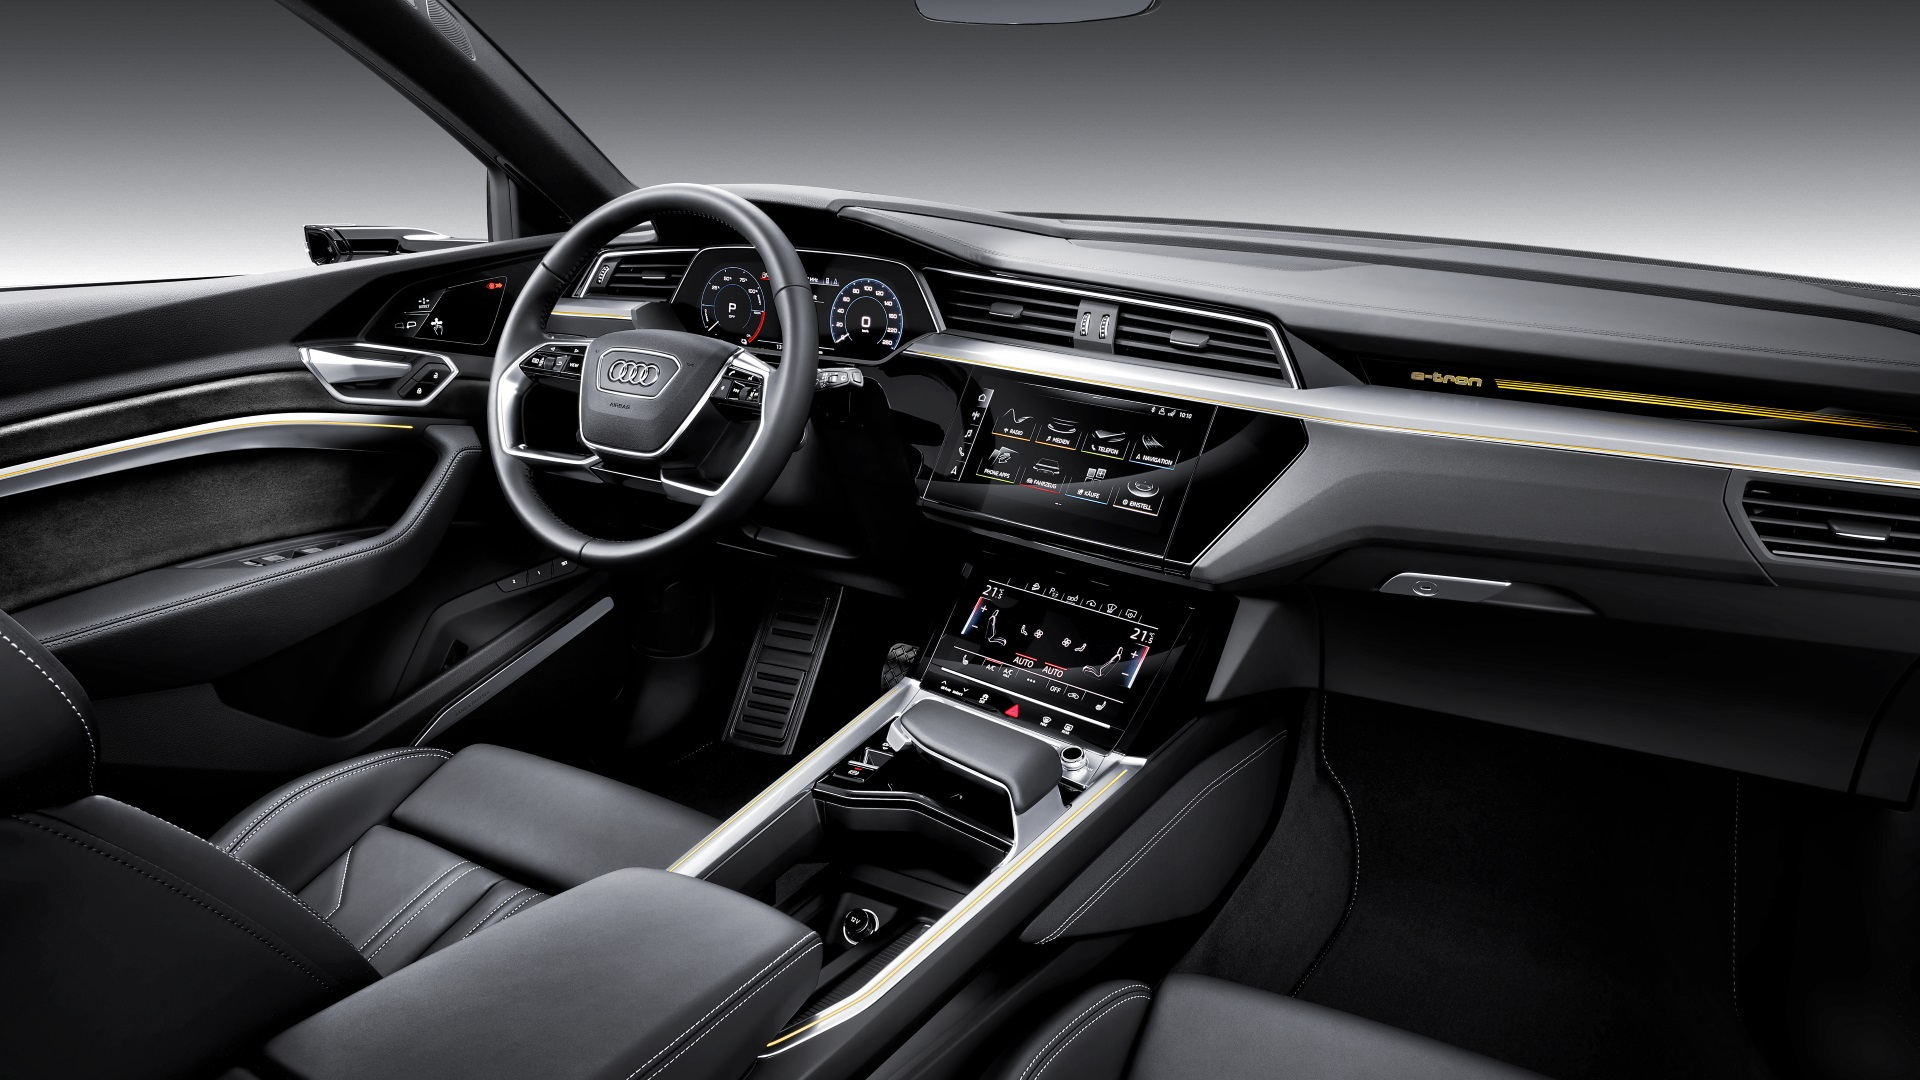 2019 Audi e-tron quattro, in European trim, at San Francisco launch event